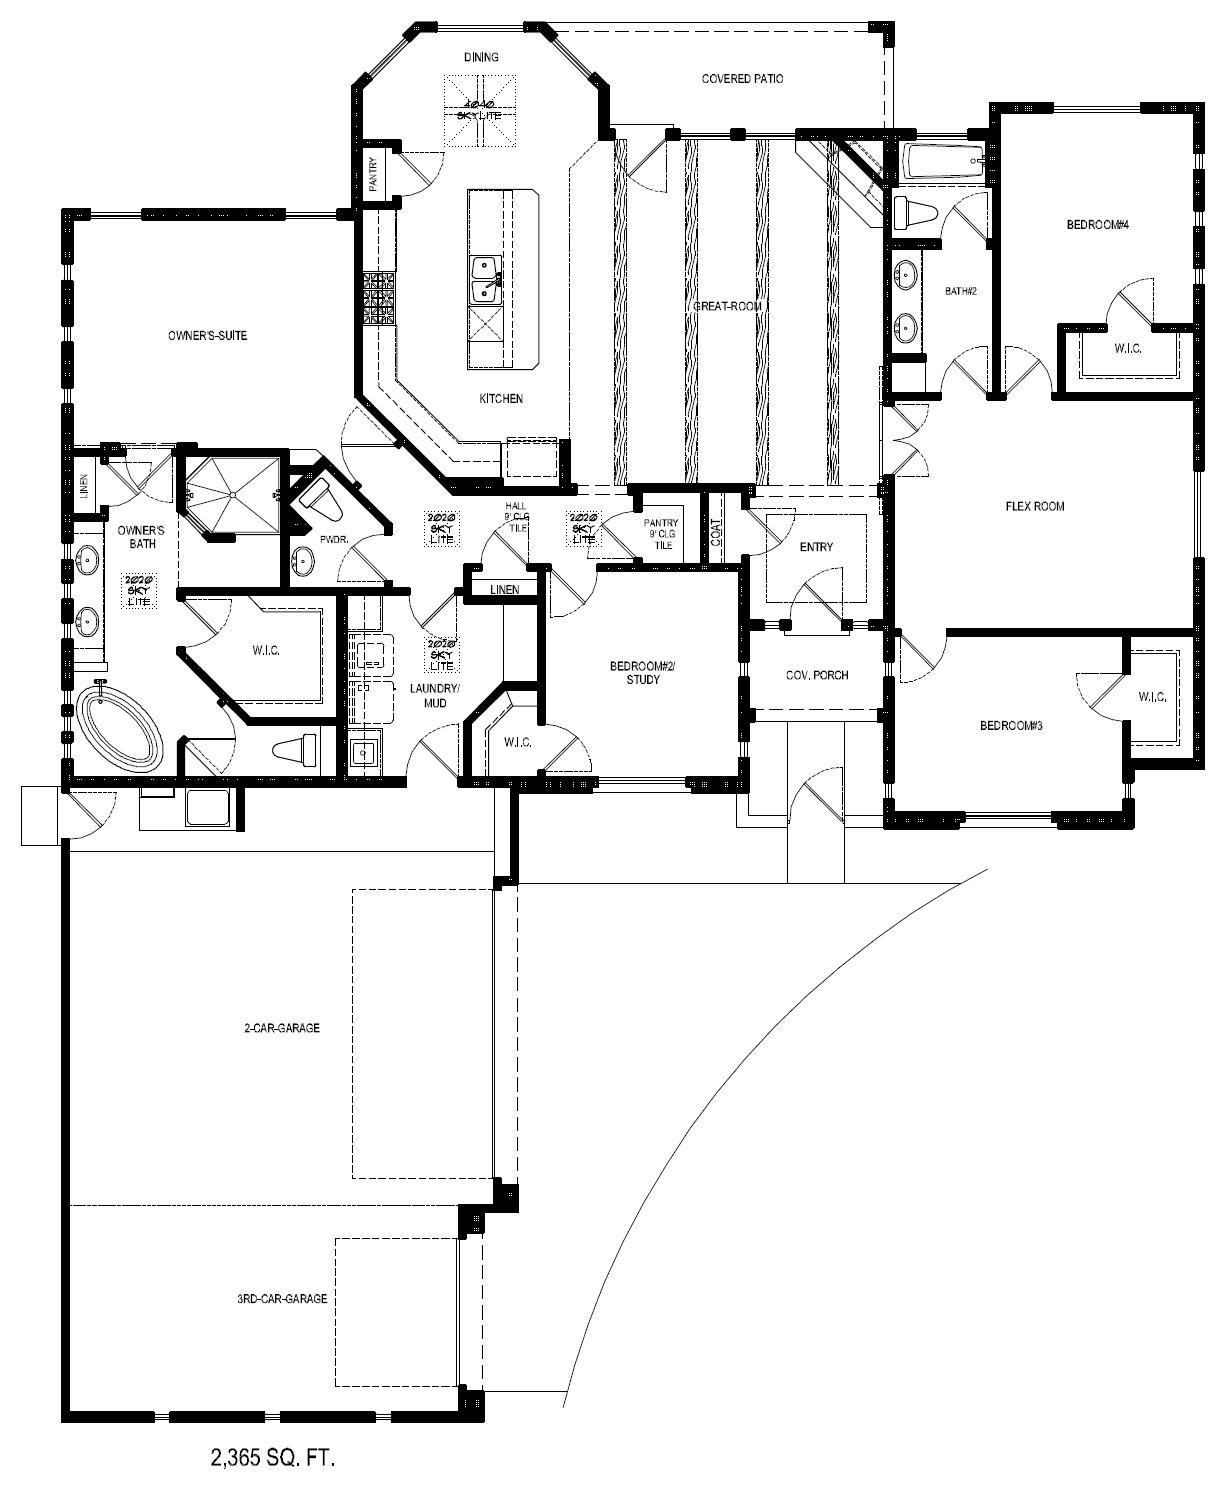 North Valley Farmhouse Floorplan